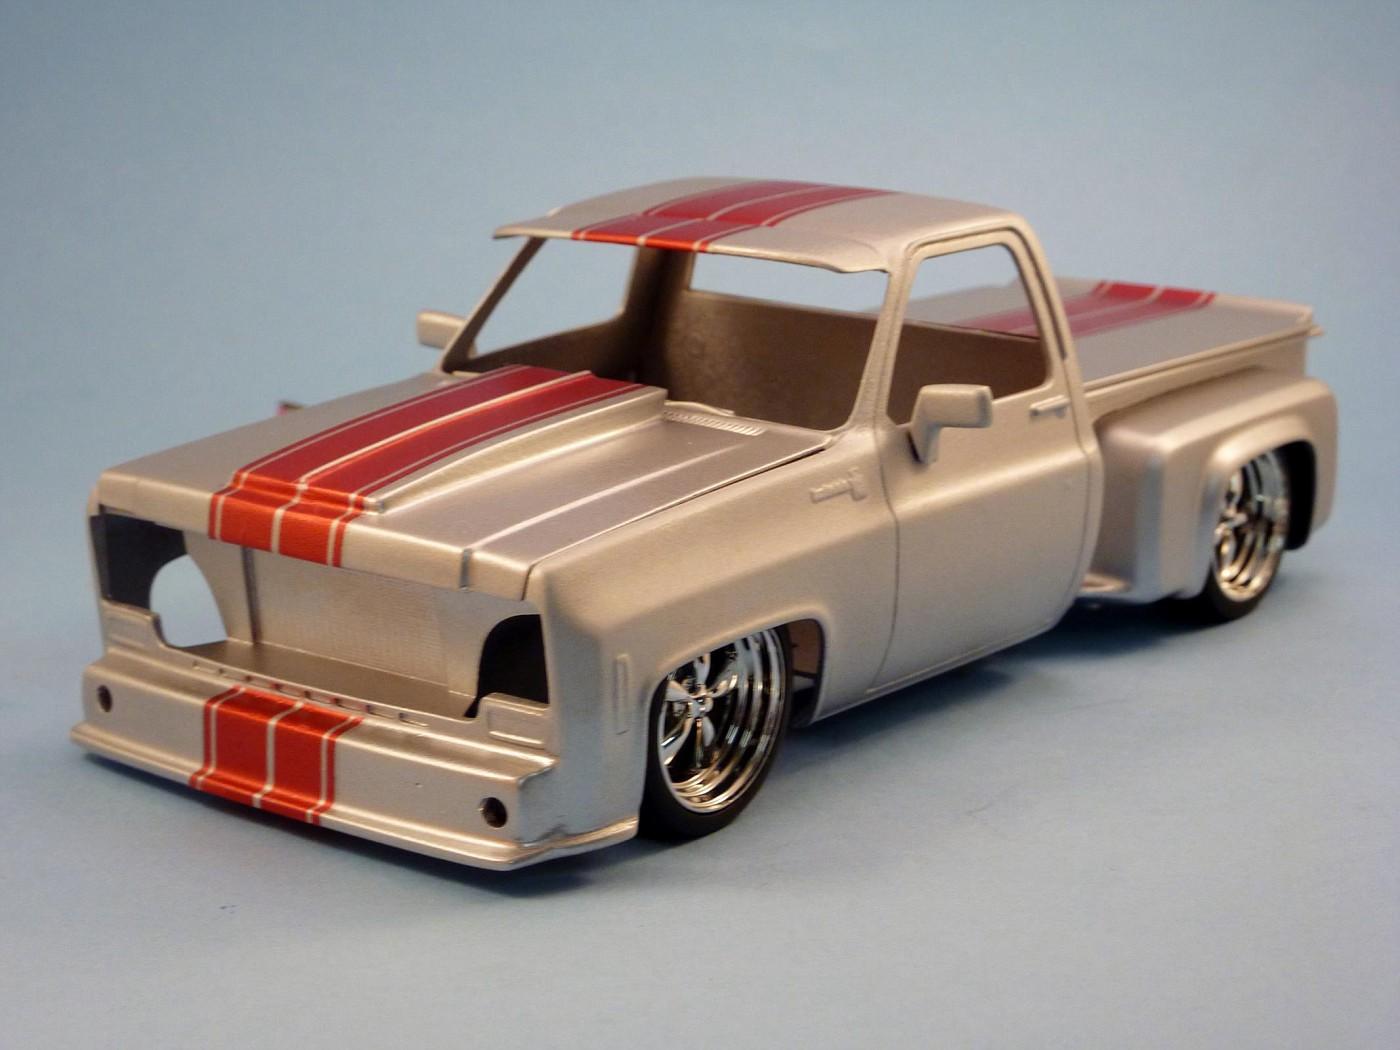 Chevrolet C 10 Pickup [Terminé] - Page 2 Photo2-vi